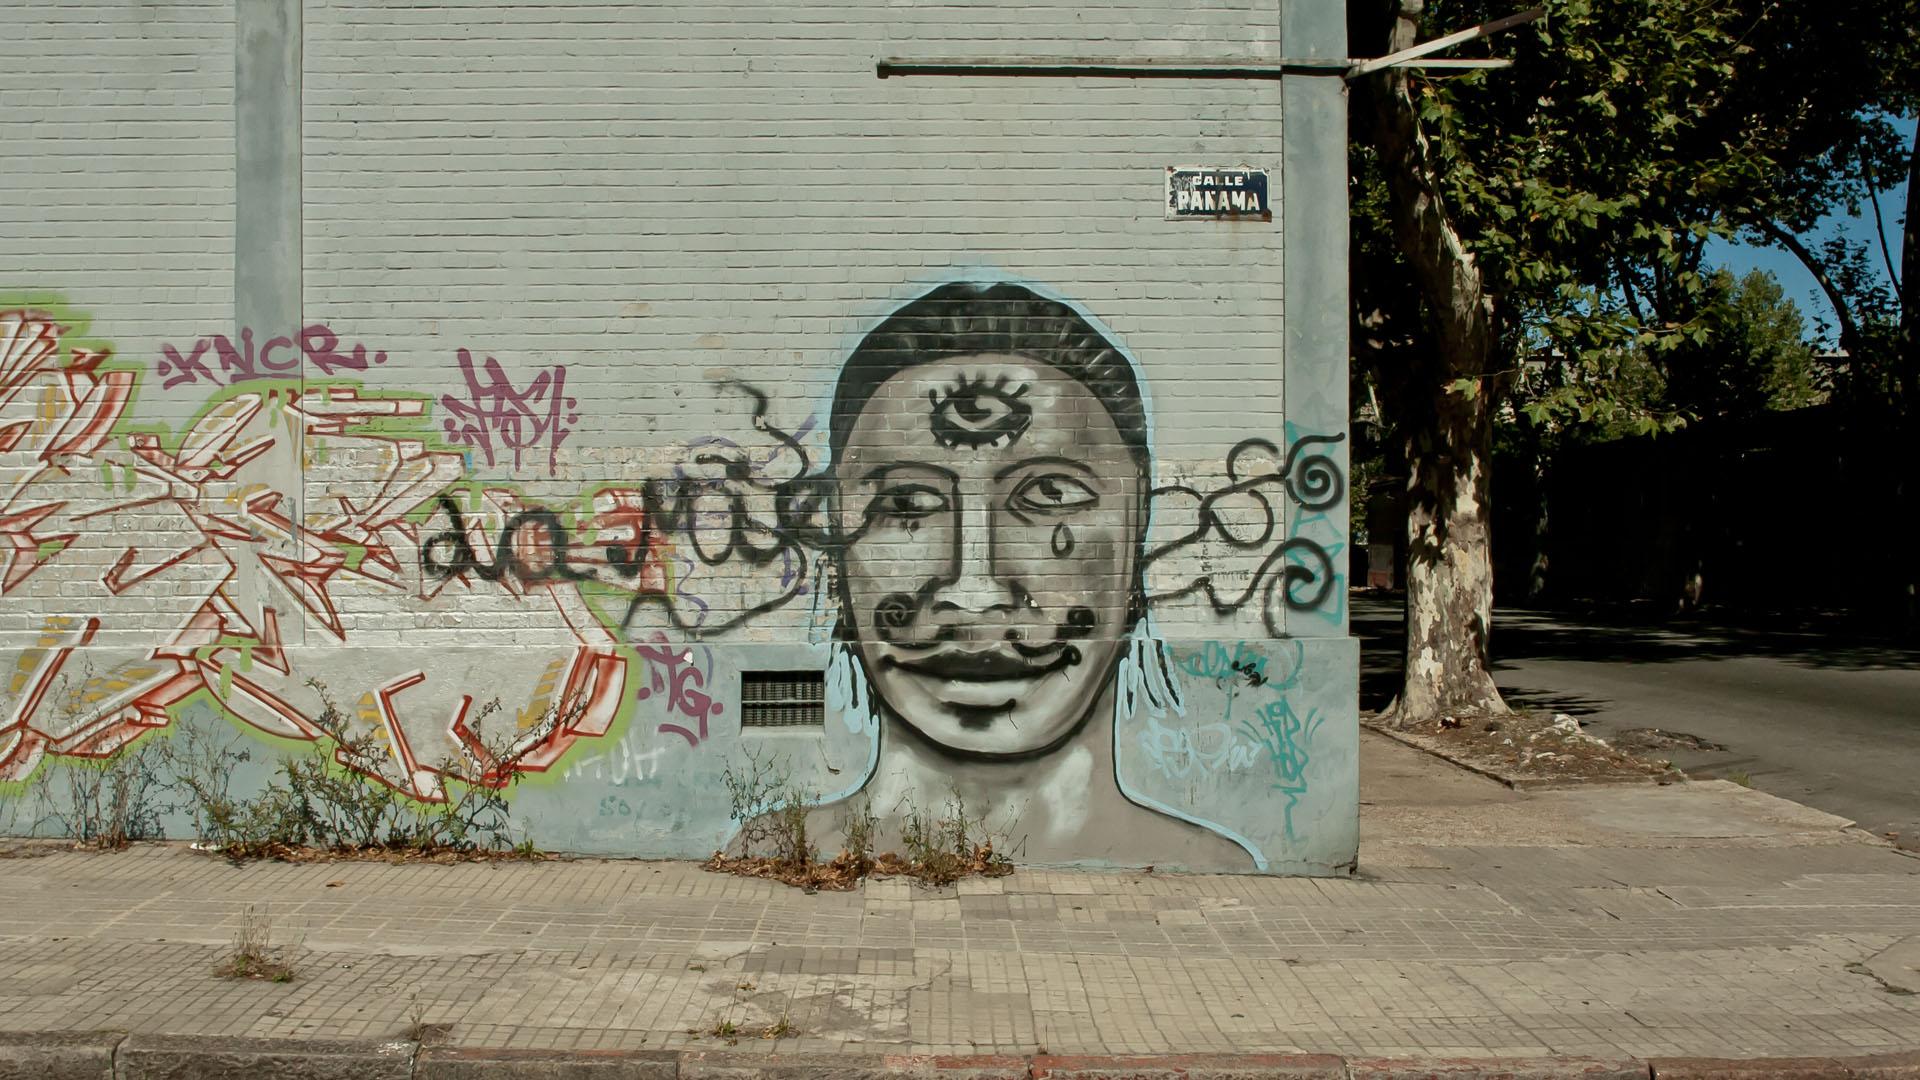 Uruguay_0006s_0008_3